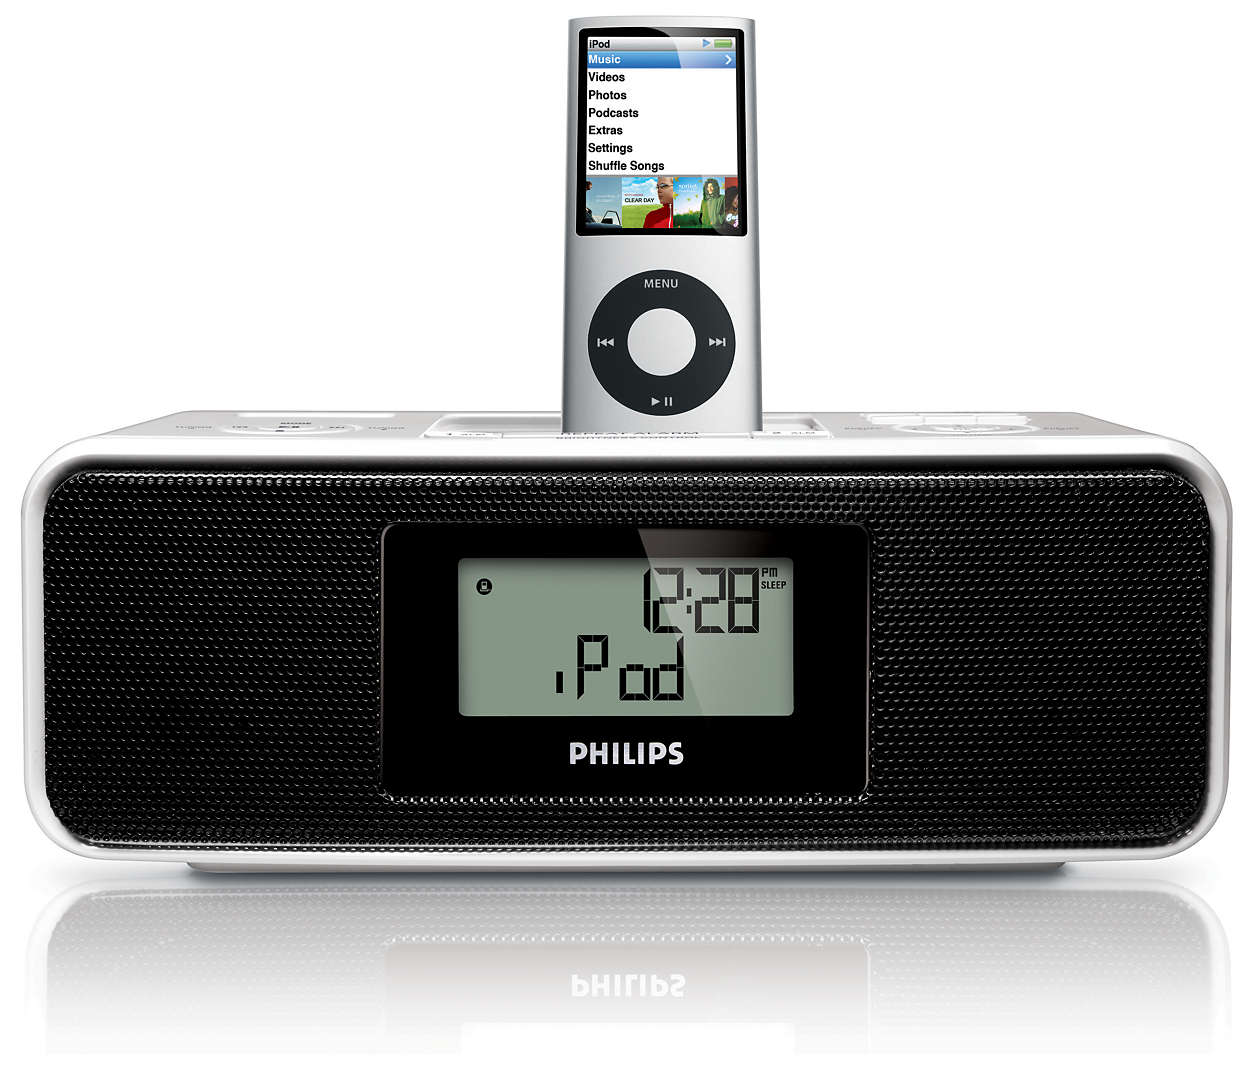 clock radio for ipod dc200 12 philips. Black Bedroom Furniture Sets. Home Design Ideas